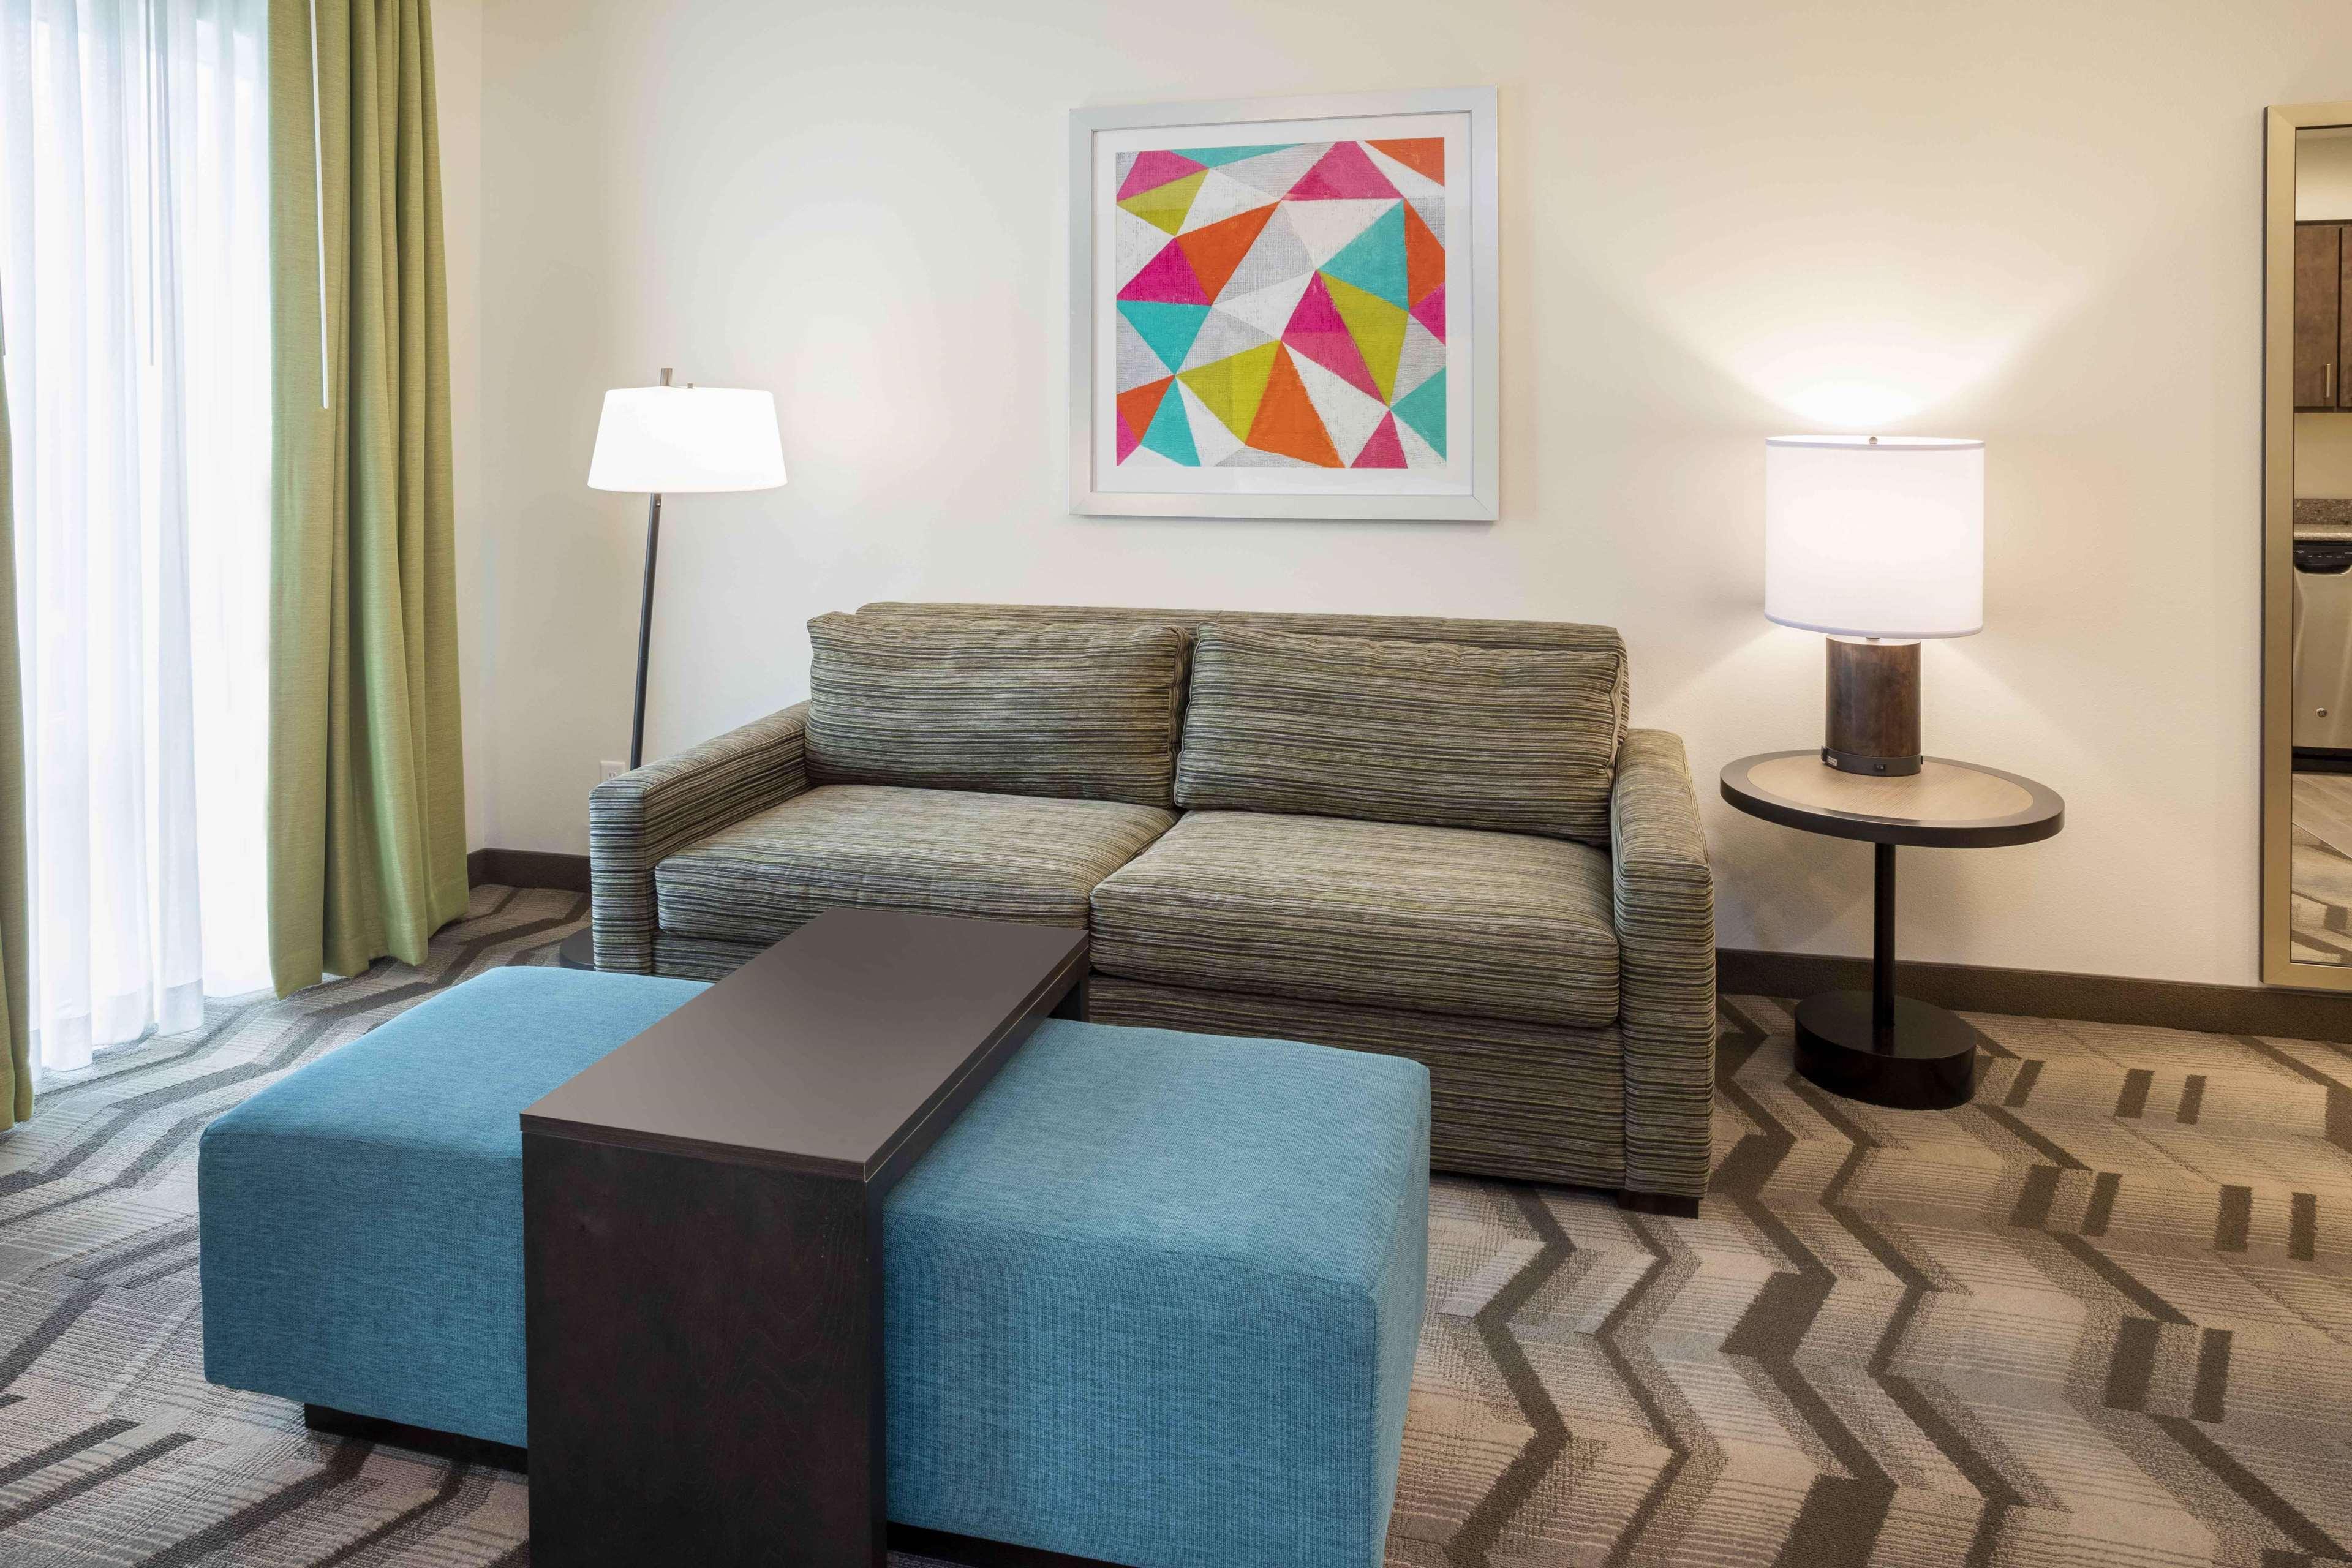 Homewood Suites by Hilton Edina Minneapolis image 23